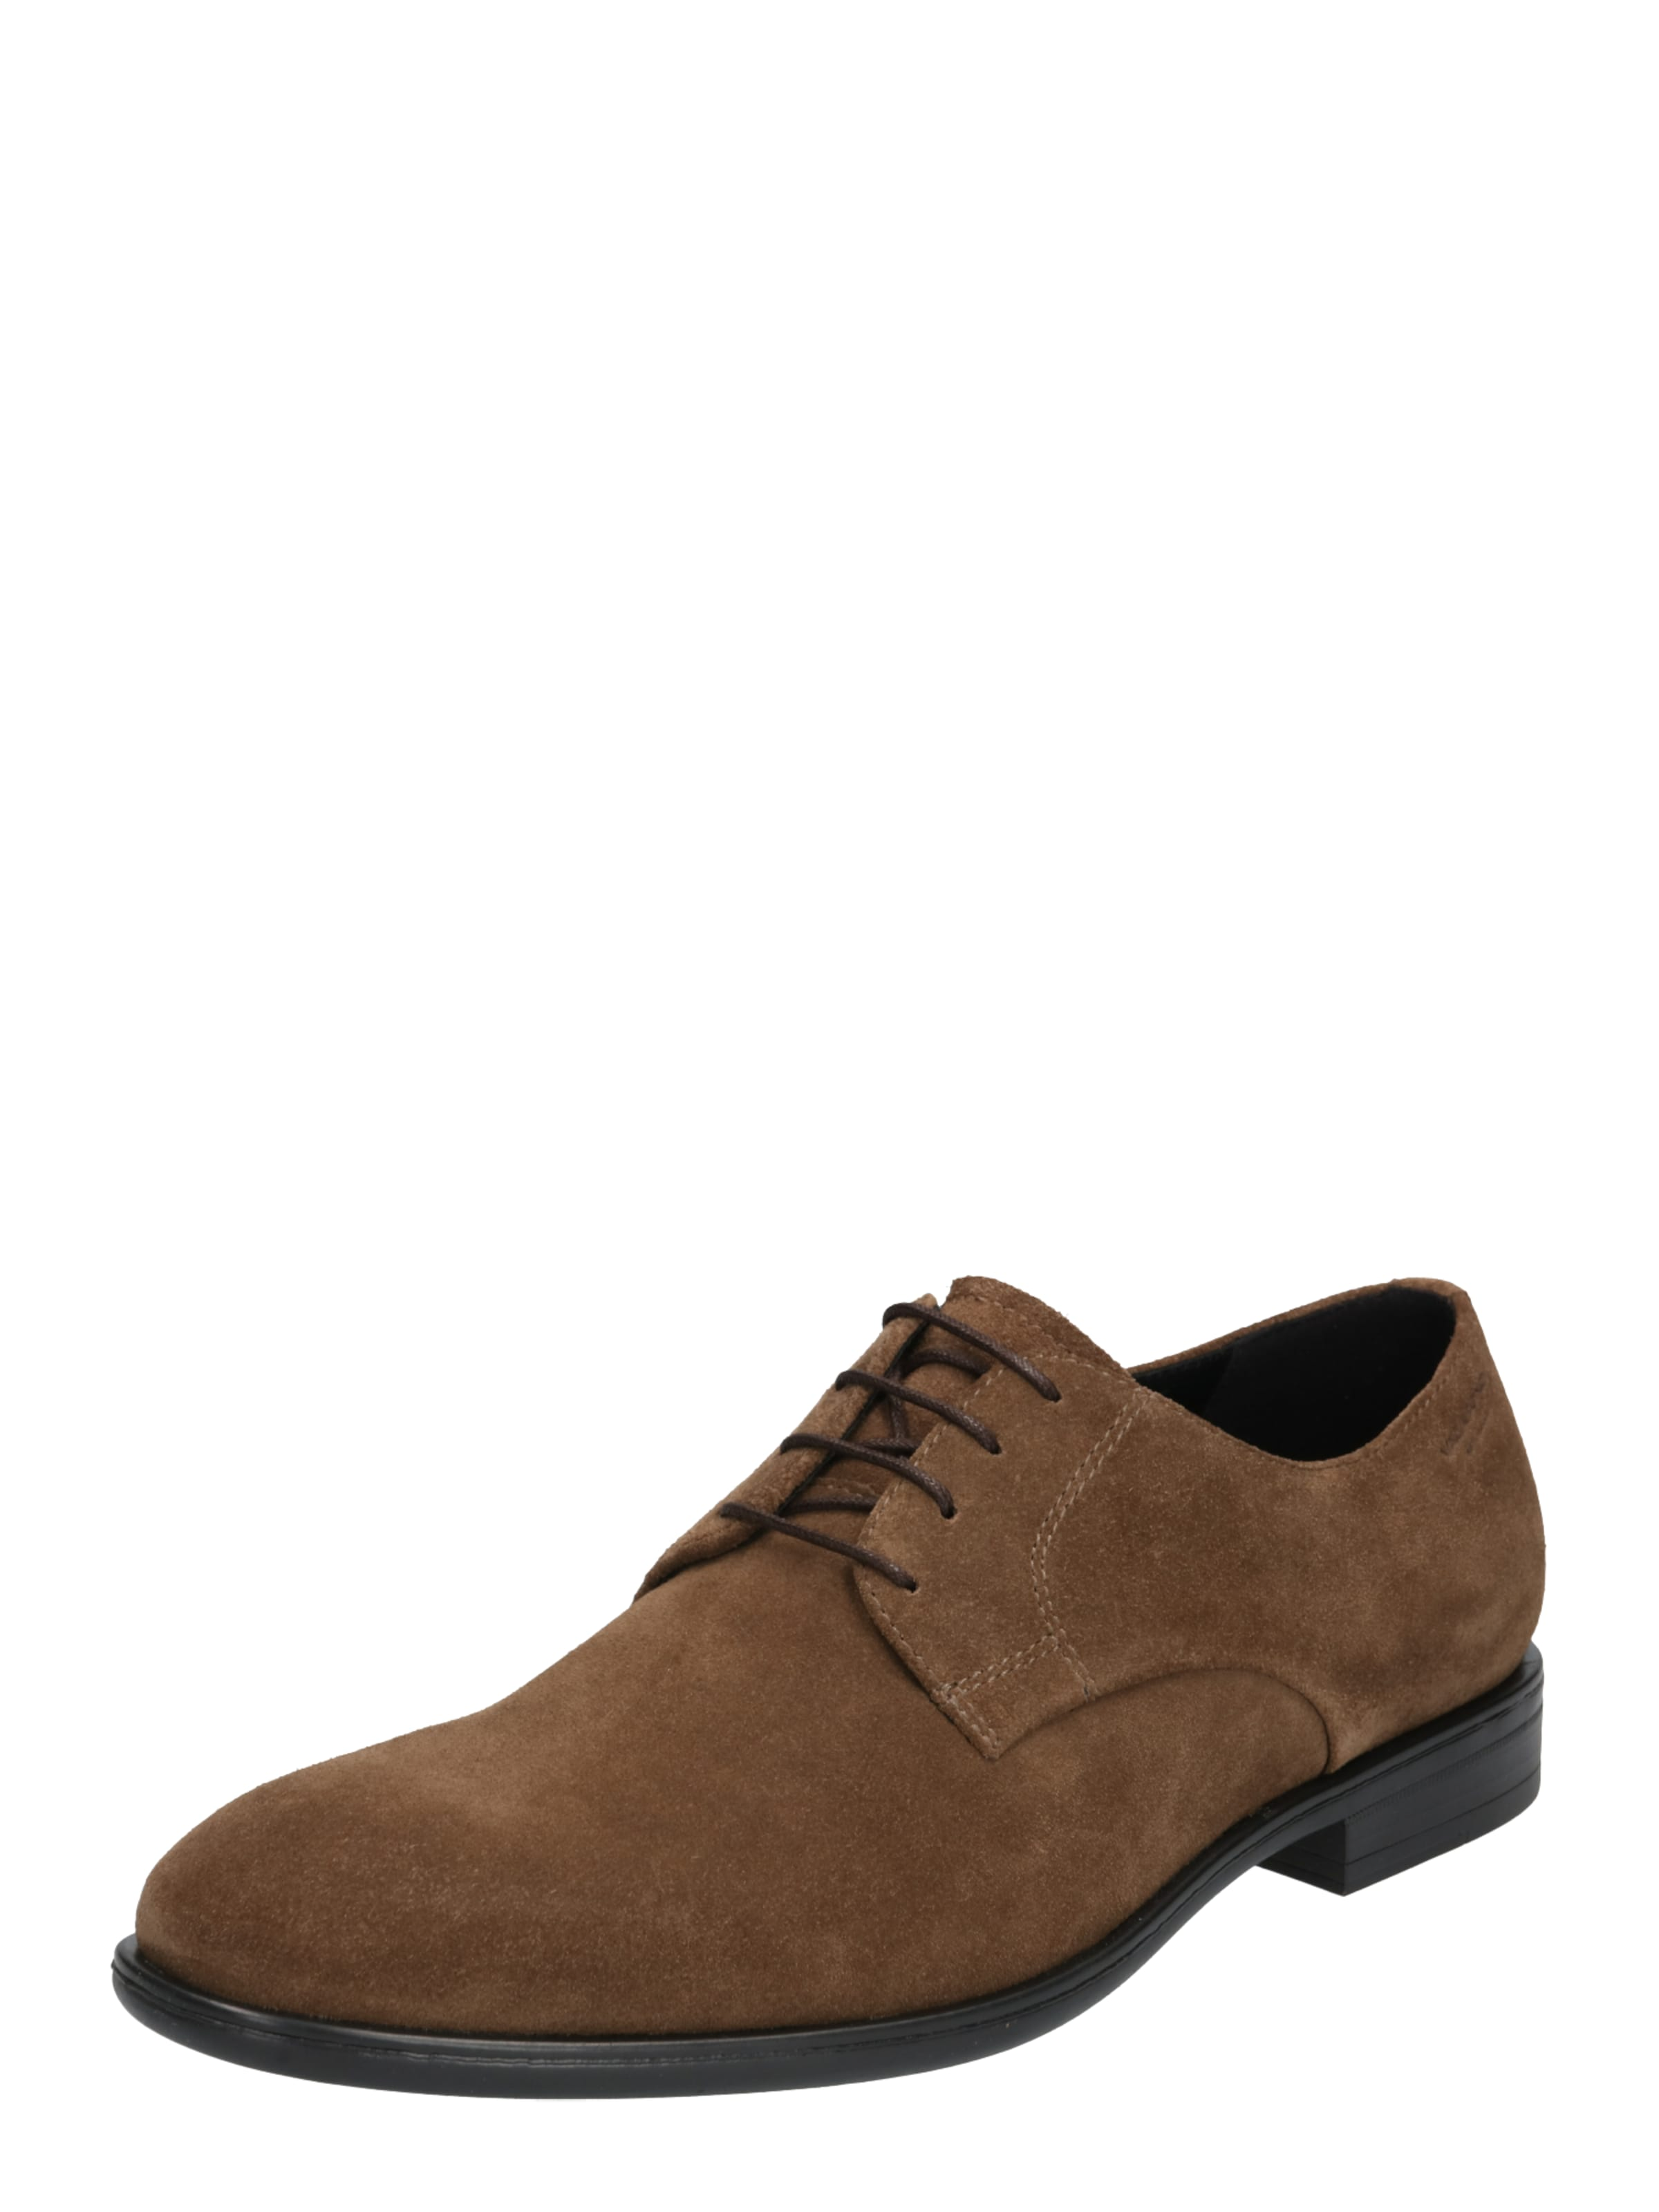 Shoemakers In GrauTaupe Halbschuhe 'harvey' Vagabond w8X0nOPk